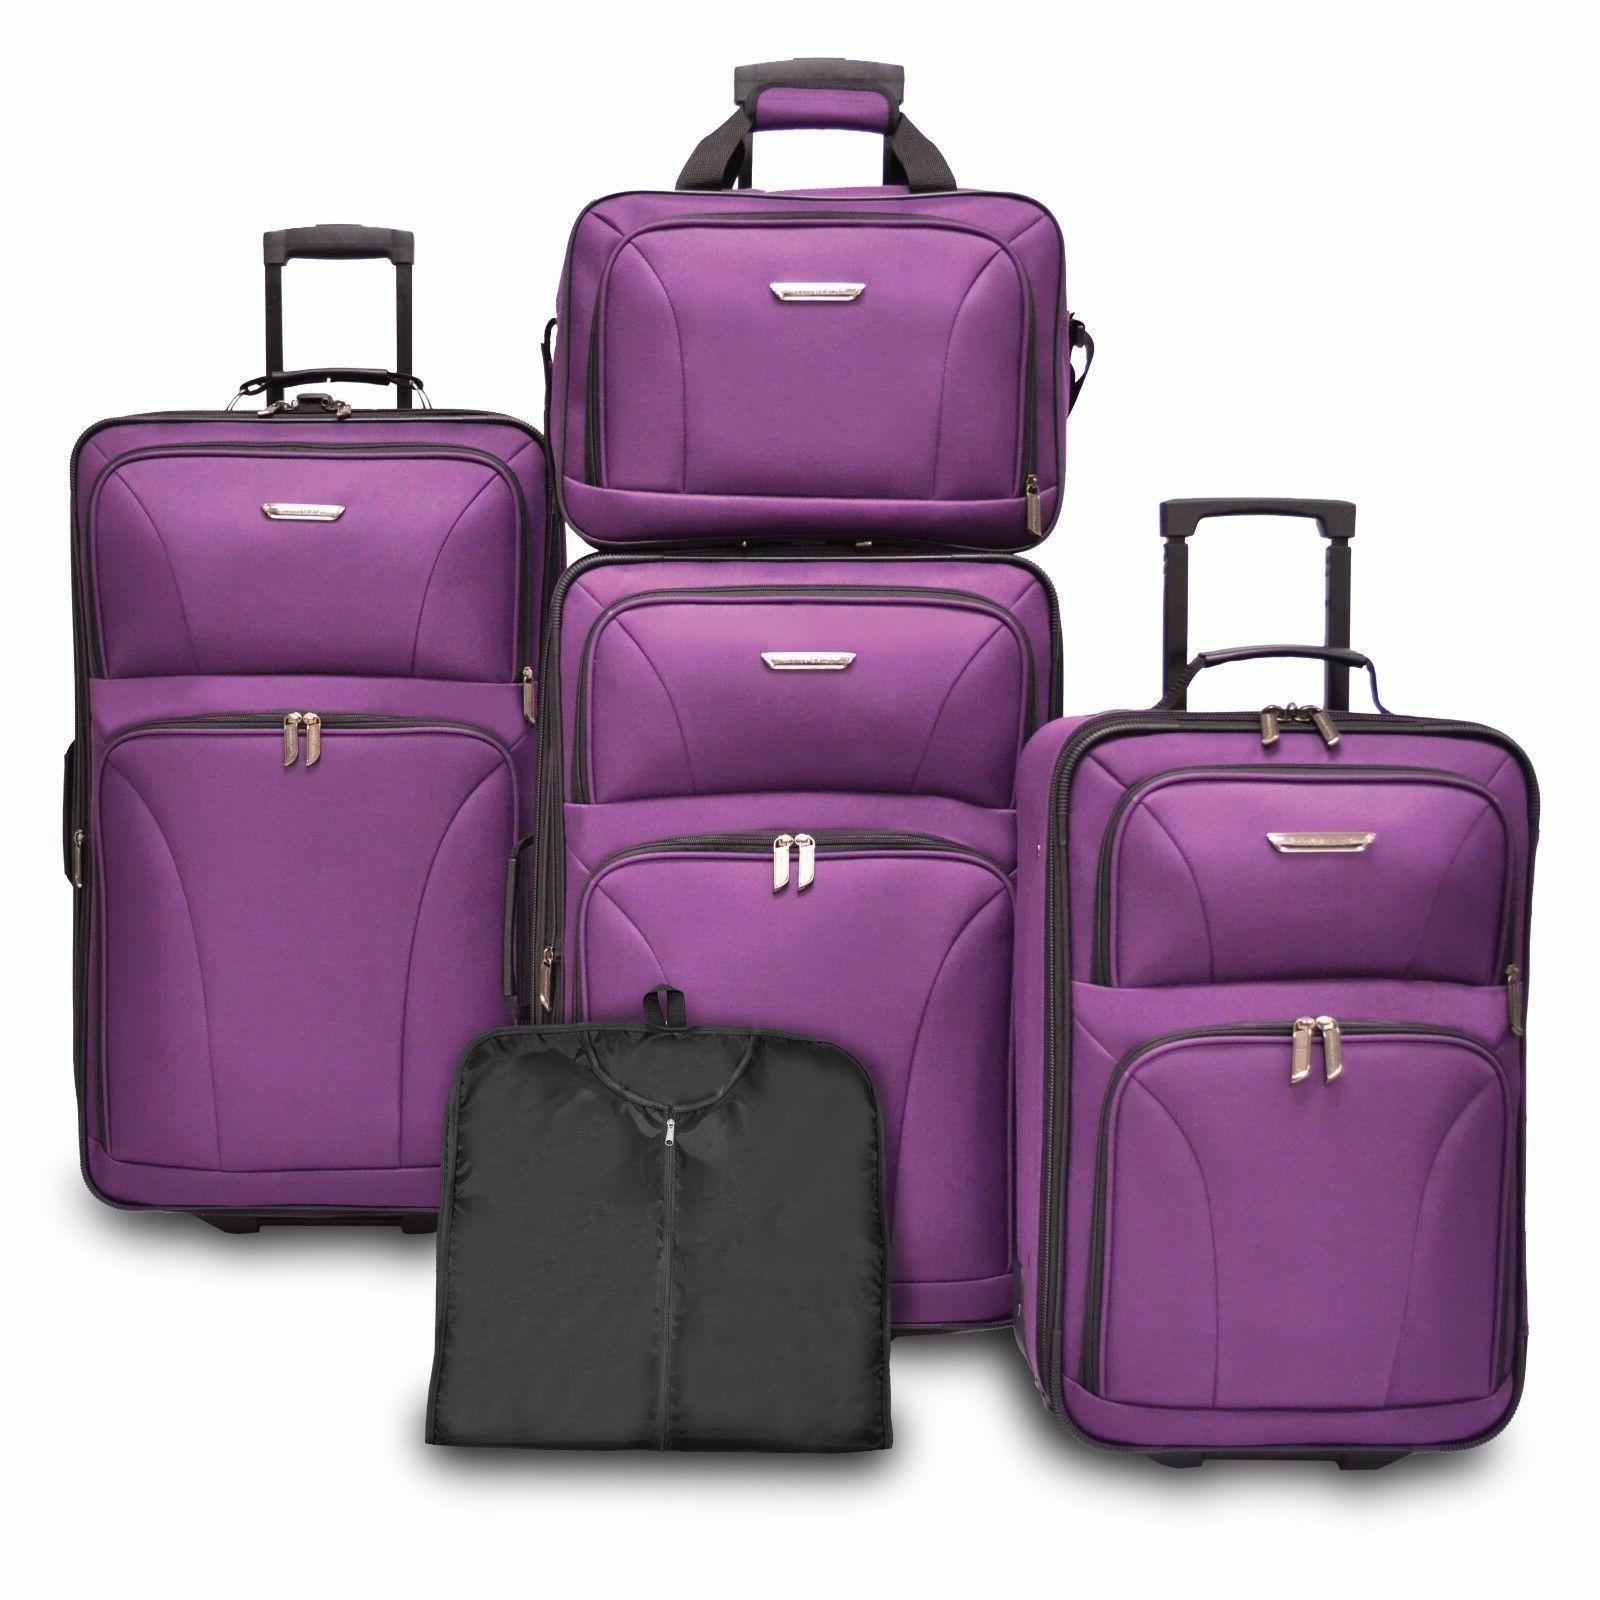 Traveler's Choice TC0835 Versatile 5-Piece Luggage Set - Pur